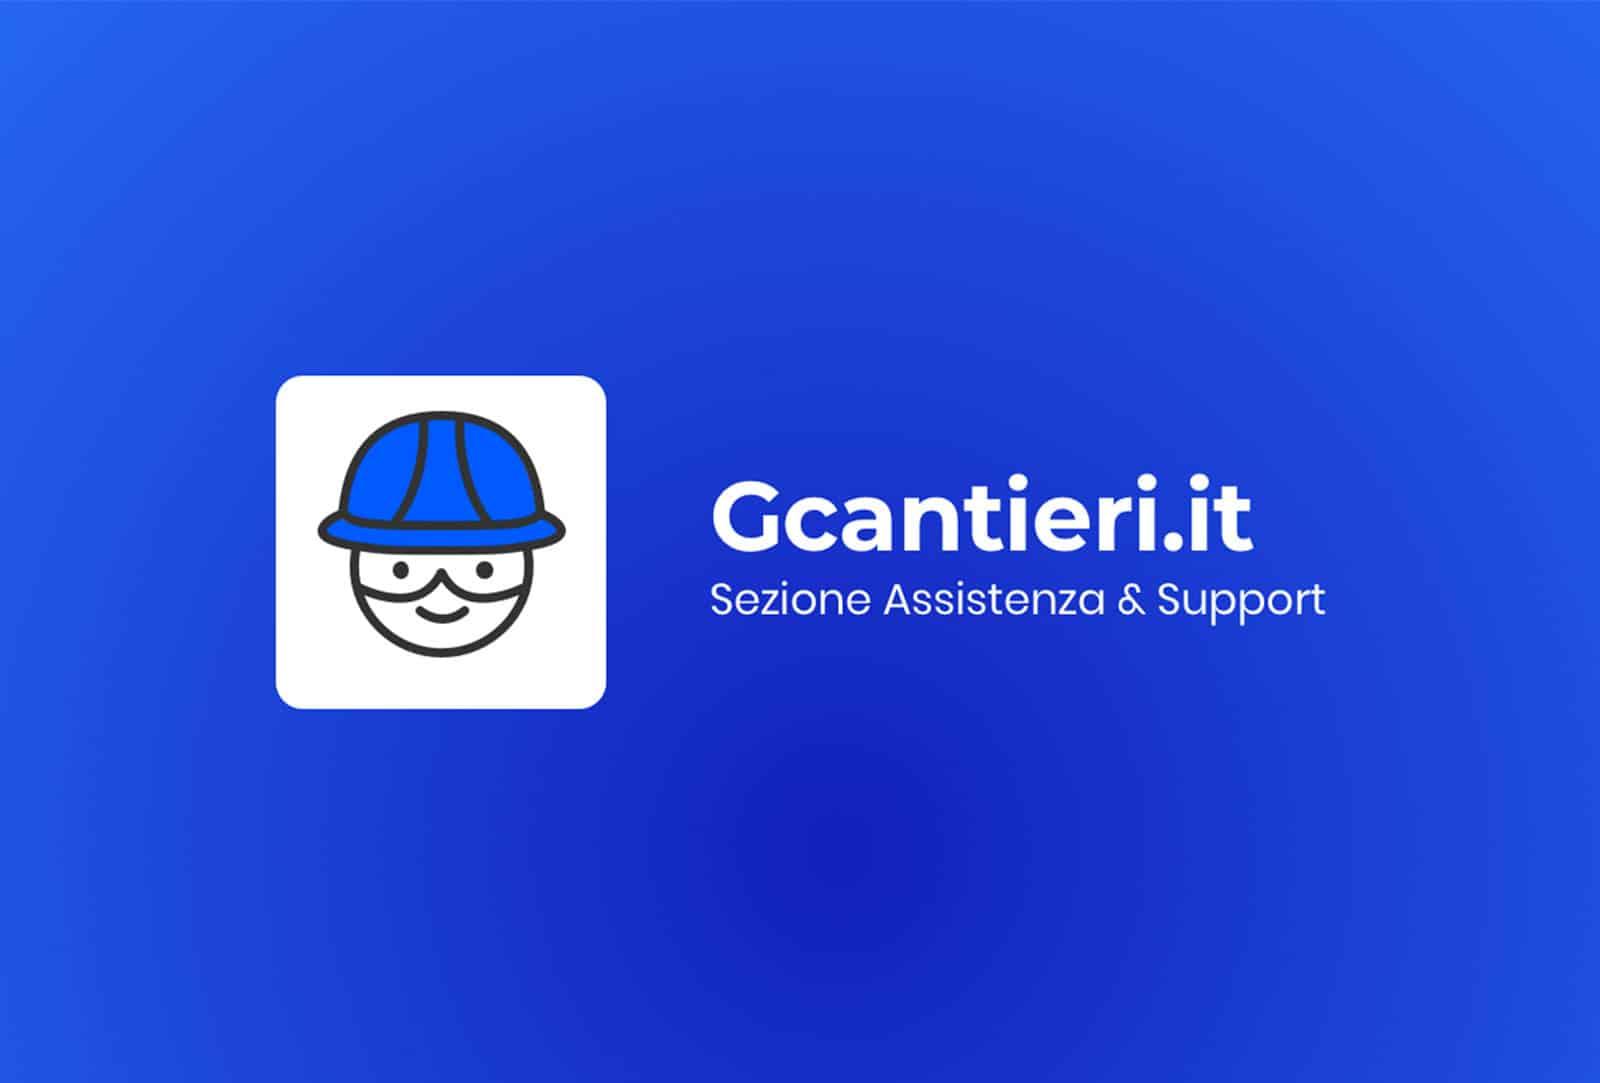 gcantieri gestionale cantieri cloud gestionale personale teroro - Gcantieri - Gestionale Cantieri e Personale